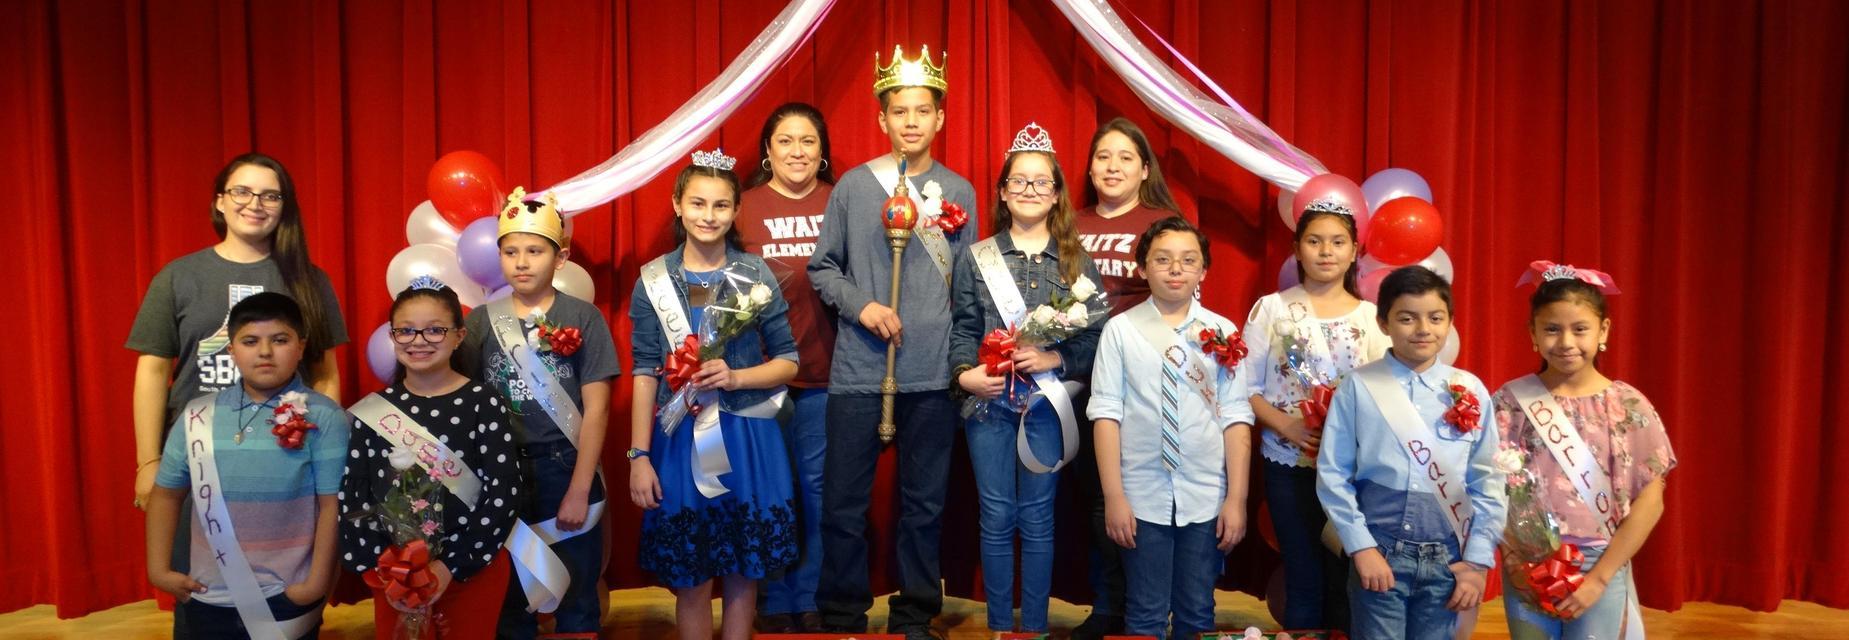 5th grade Royal Court